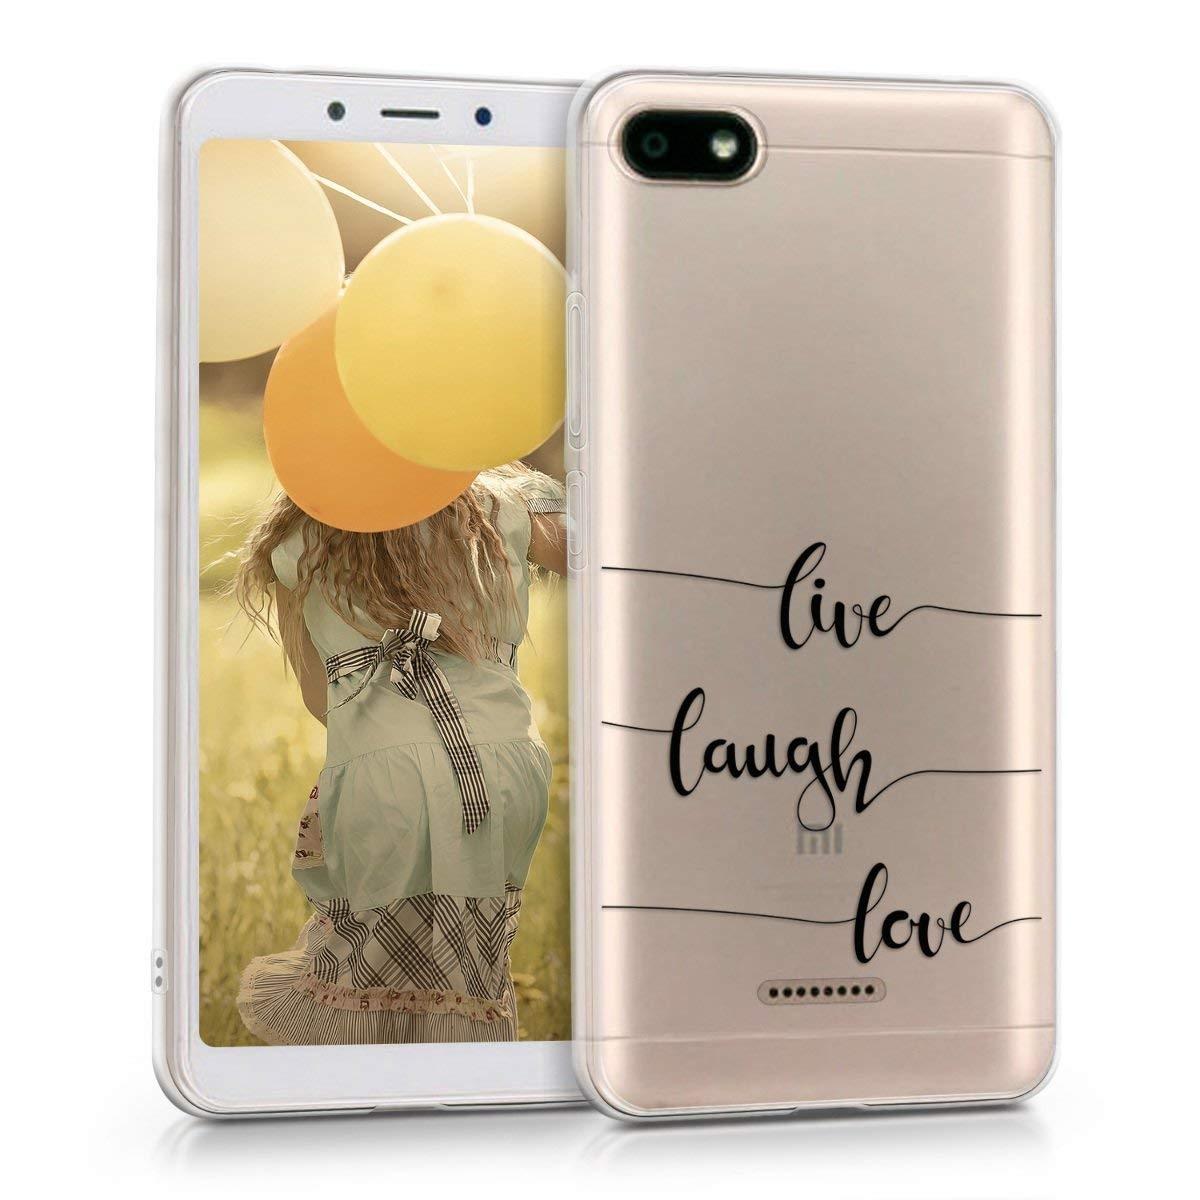 KW Θήκη Σιλικόνης Διάφανη Xiaomi Redmi 6A - Live Laugh Love (45587.01)